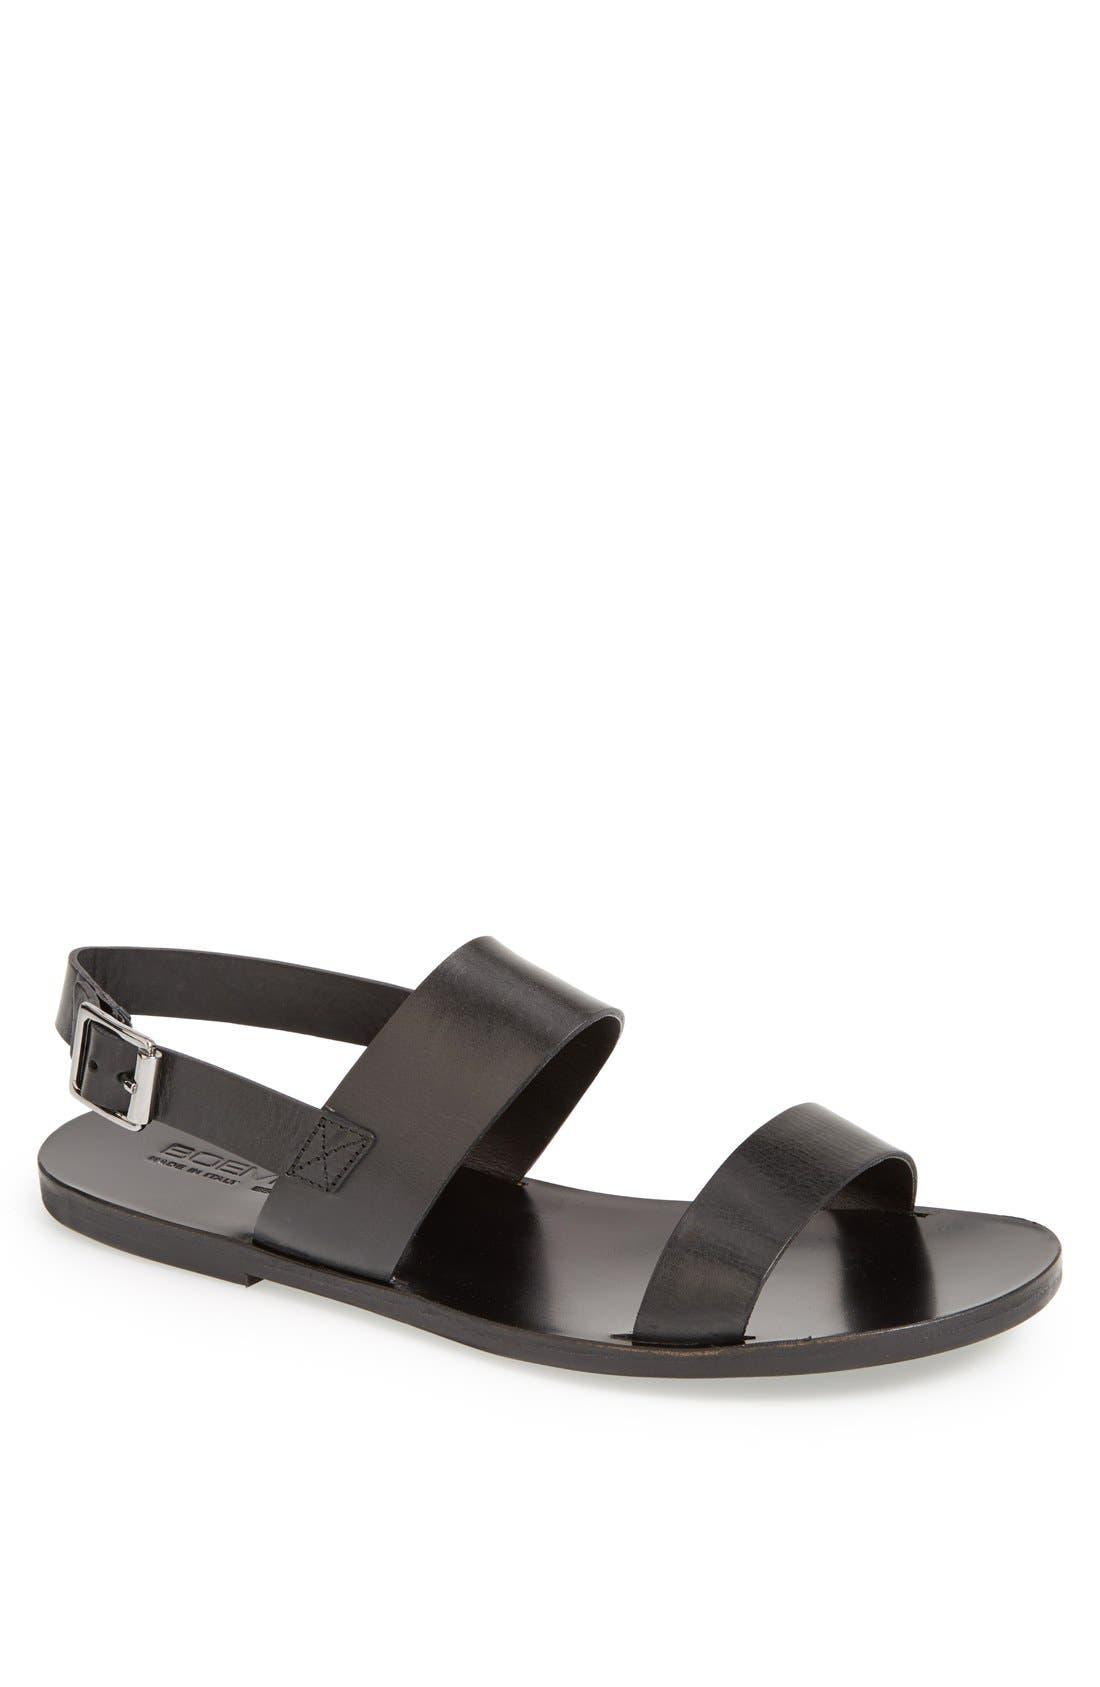 Alternate Image 1 Selected - Boemos Leather Sandal (Men)